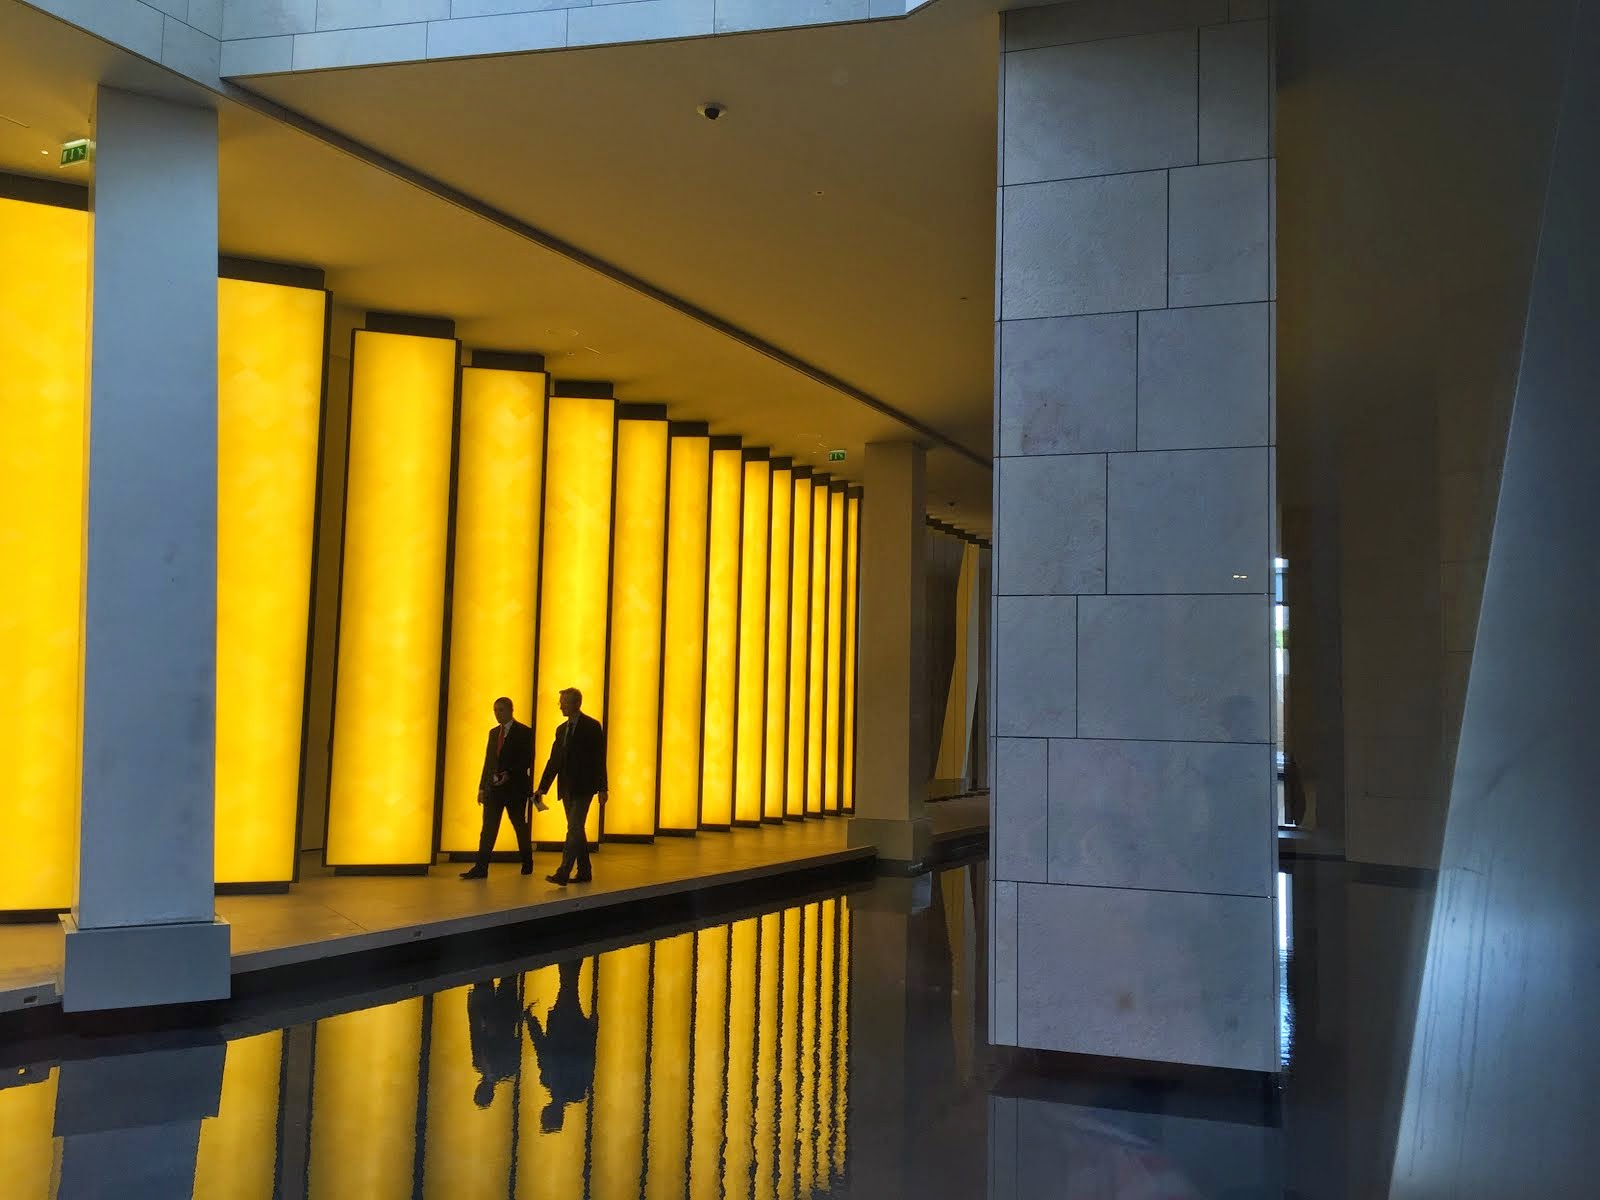 Reflecting pool, Foundation Louis Vuitton